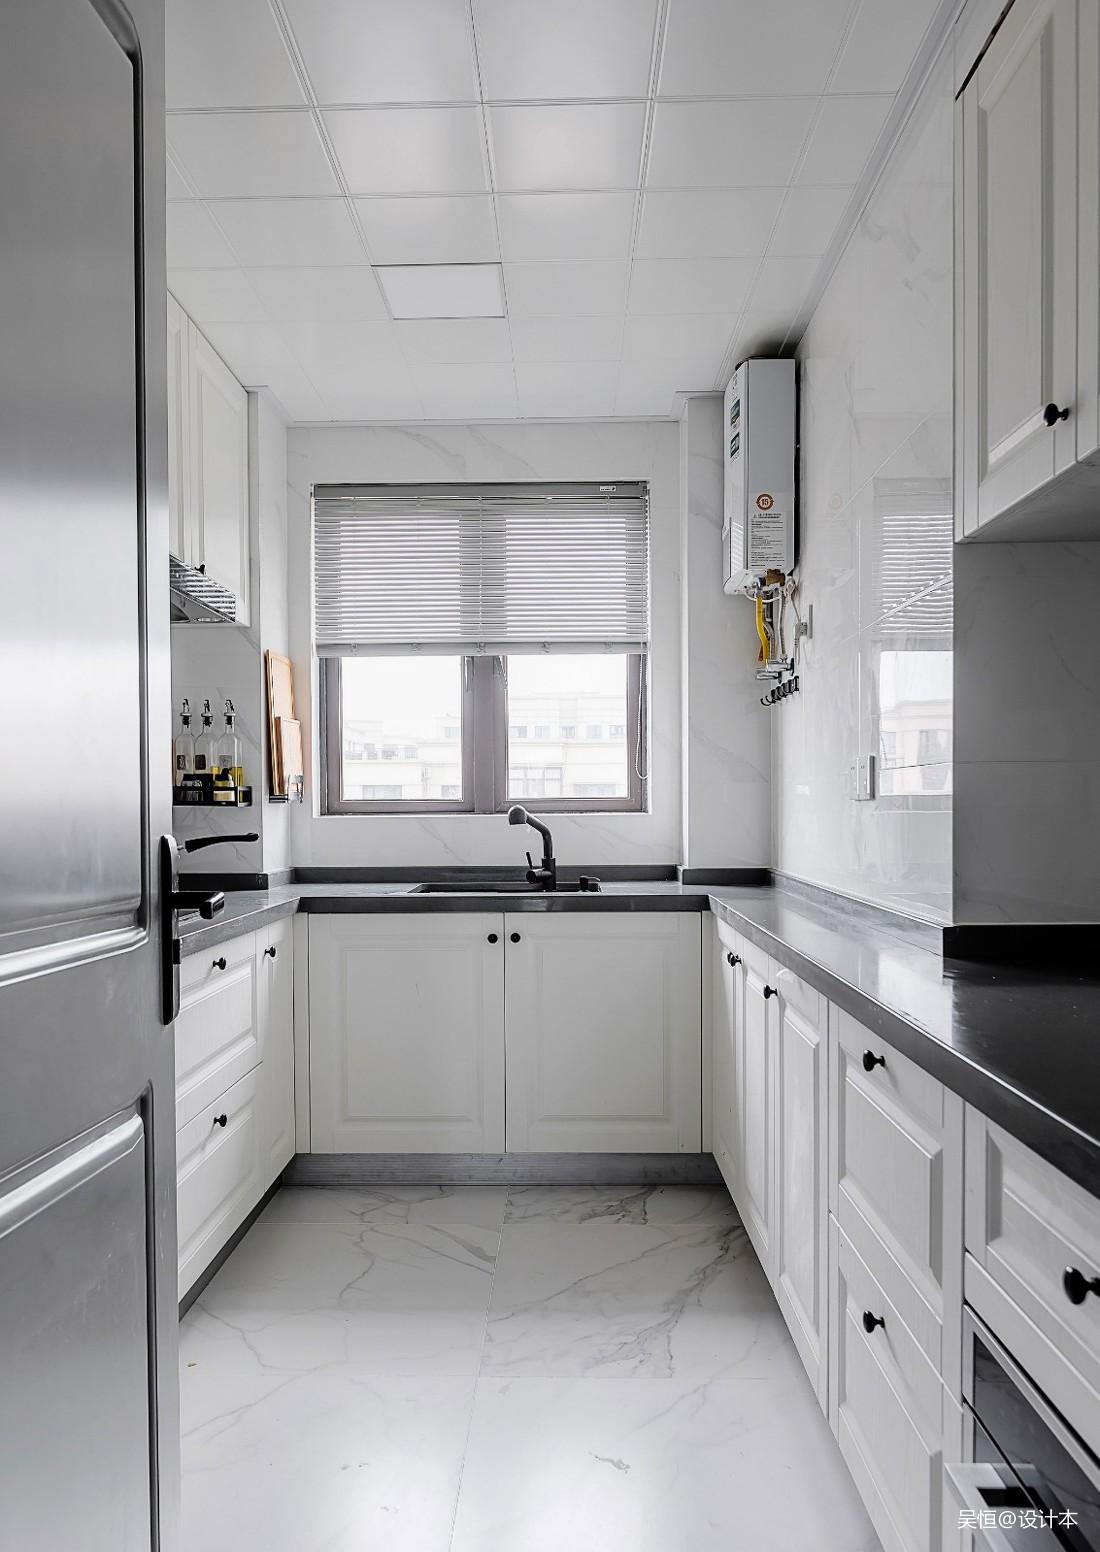 沢灰   现代or复古混搭——厨房图片